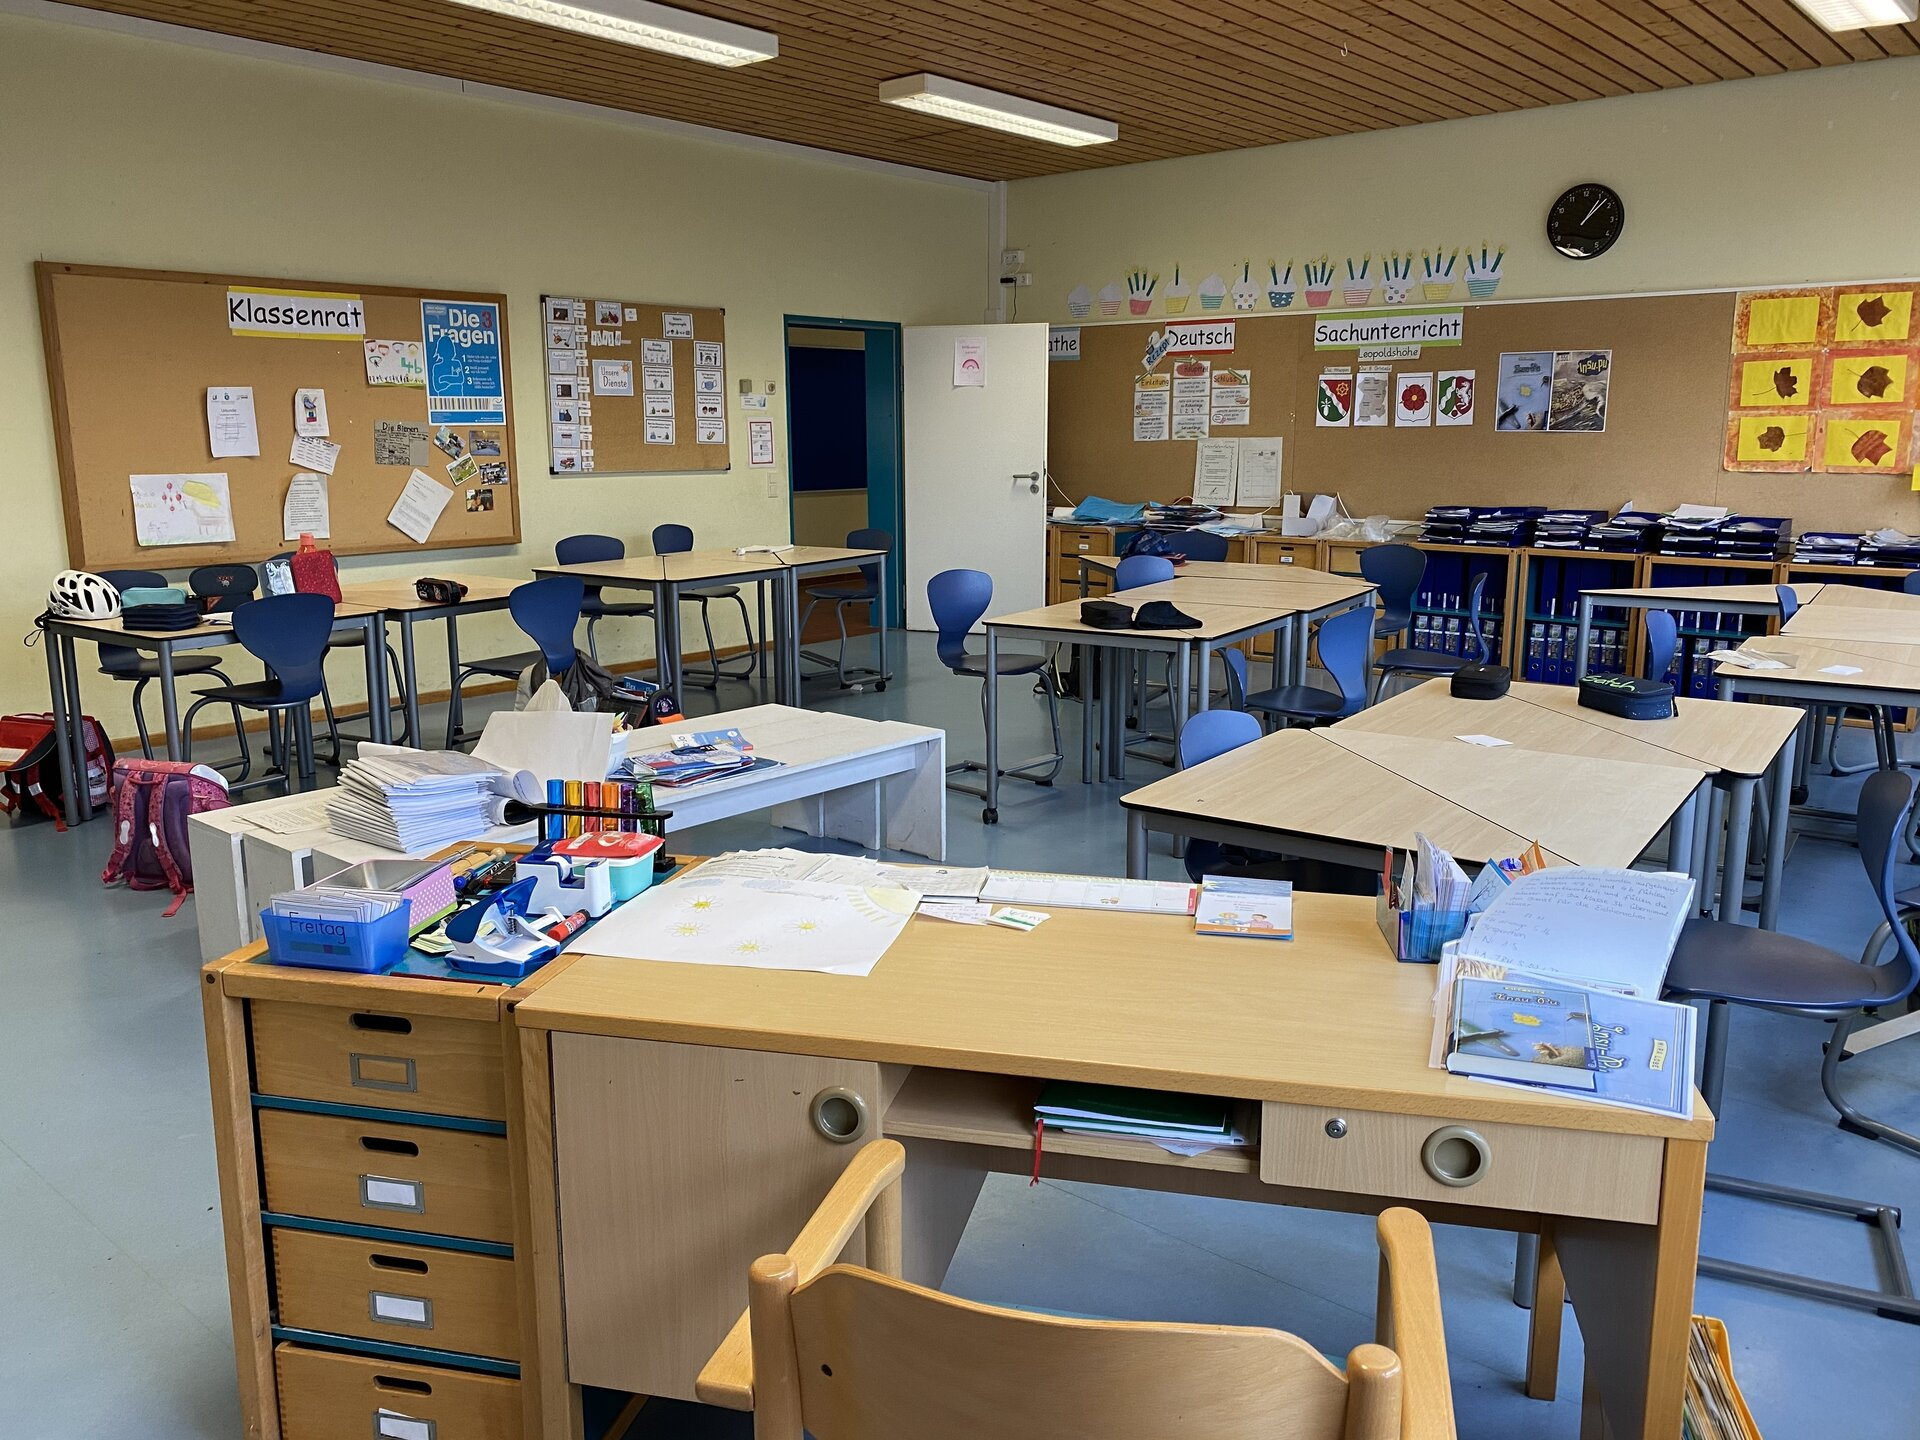 Klassenraum3-4